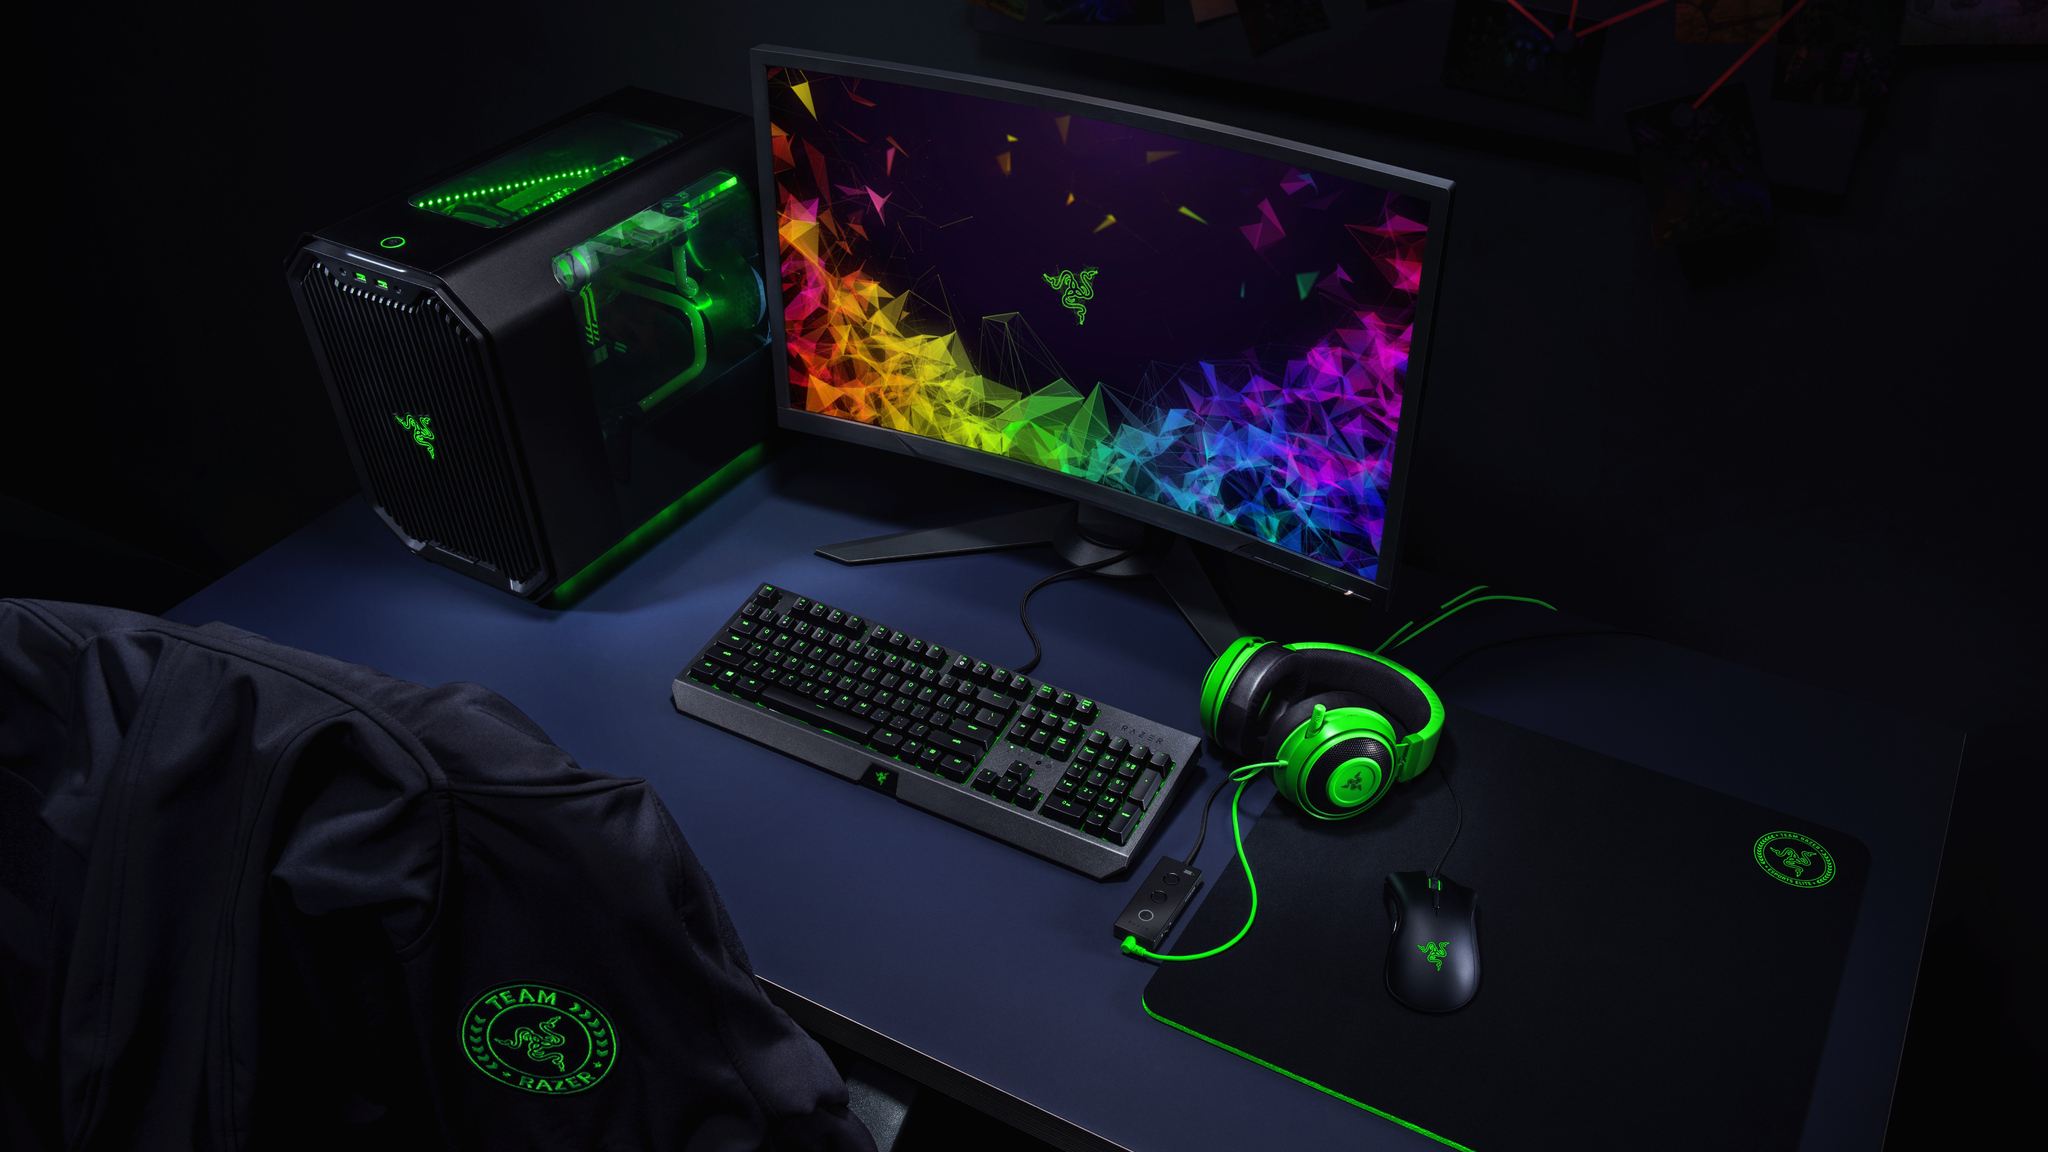 2048x1152 Razer Gaming Setup 8k 2048x1152 Resolution Hd 4k